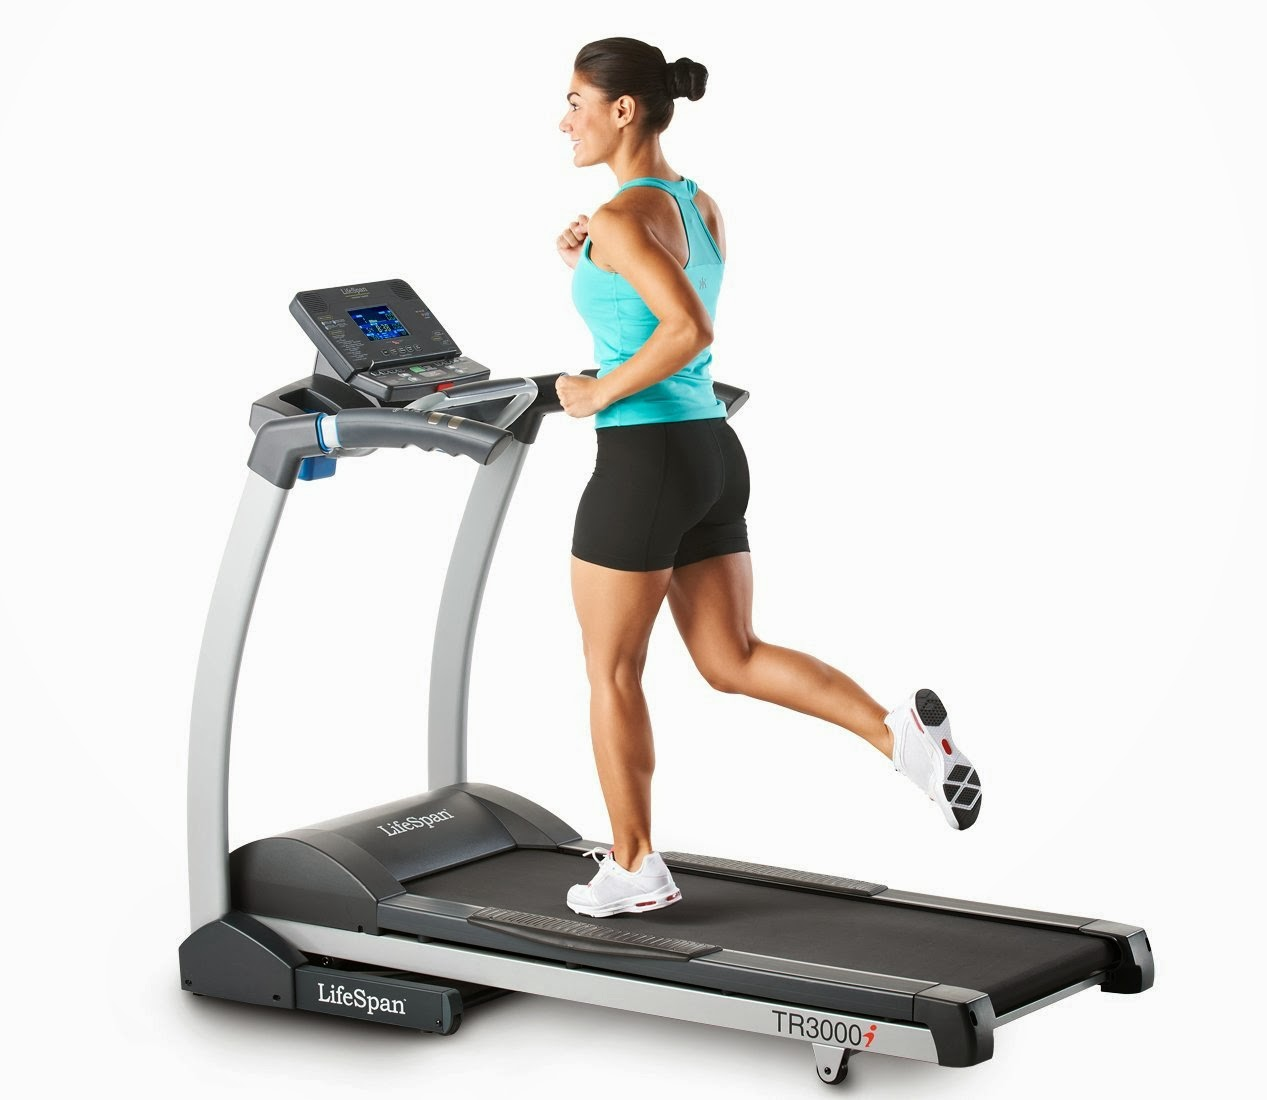 Life Fitness Treadmill Comparison: Health And Fitness Den: LifeSpan Fitness TR4000i Versus